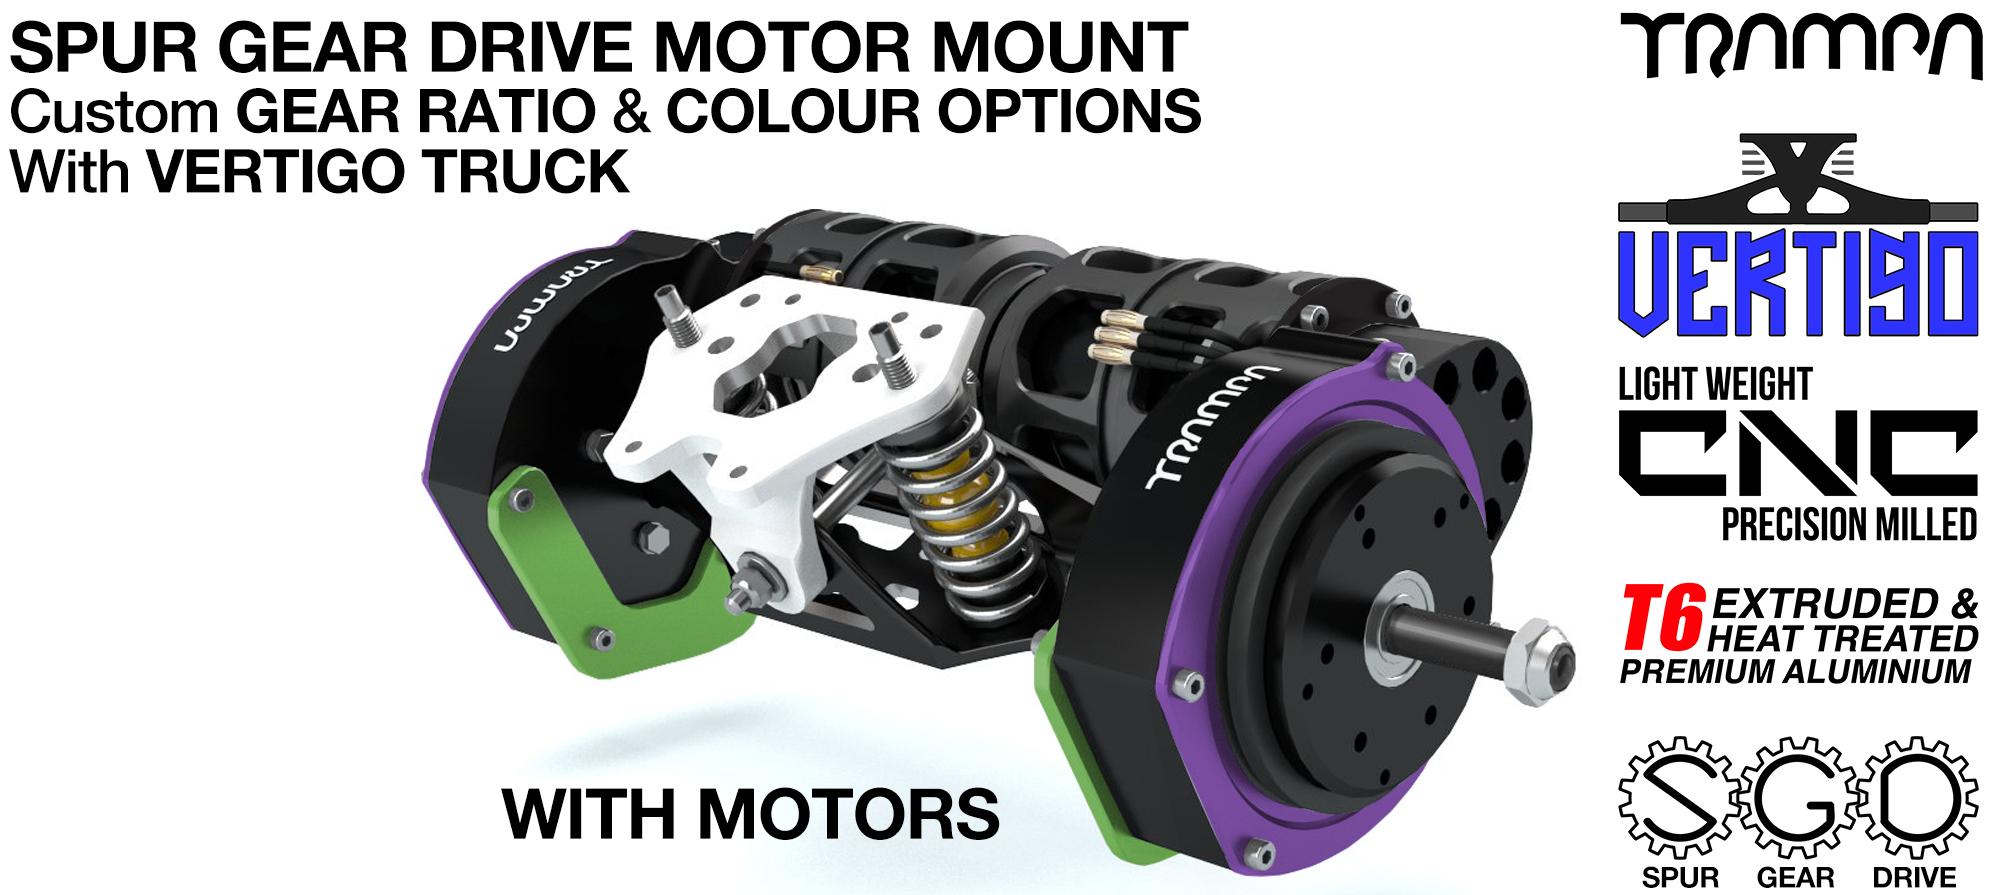 Spur Gear Drive Mountainboard Motor Mount & VERTIGO Truck